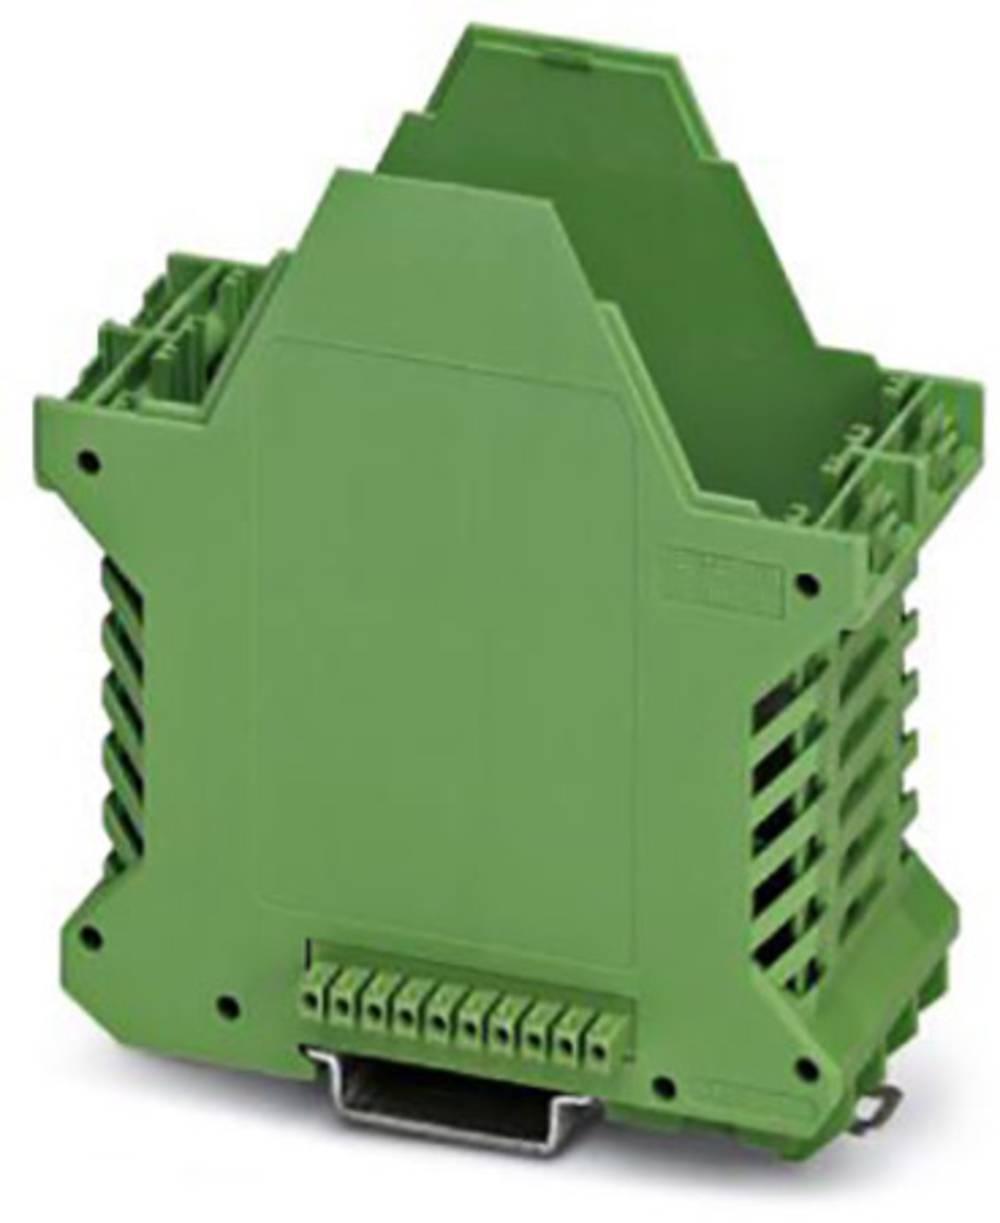 DIN-skinnekabinet underdel Phoenix Contact ME 45 UT BUS/10 GN Polyamid 10 stk